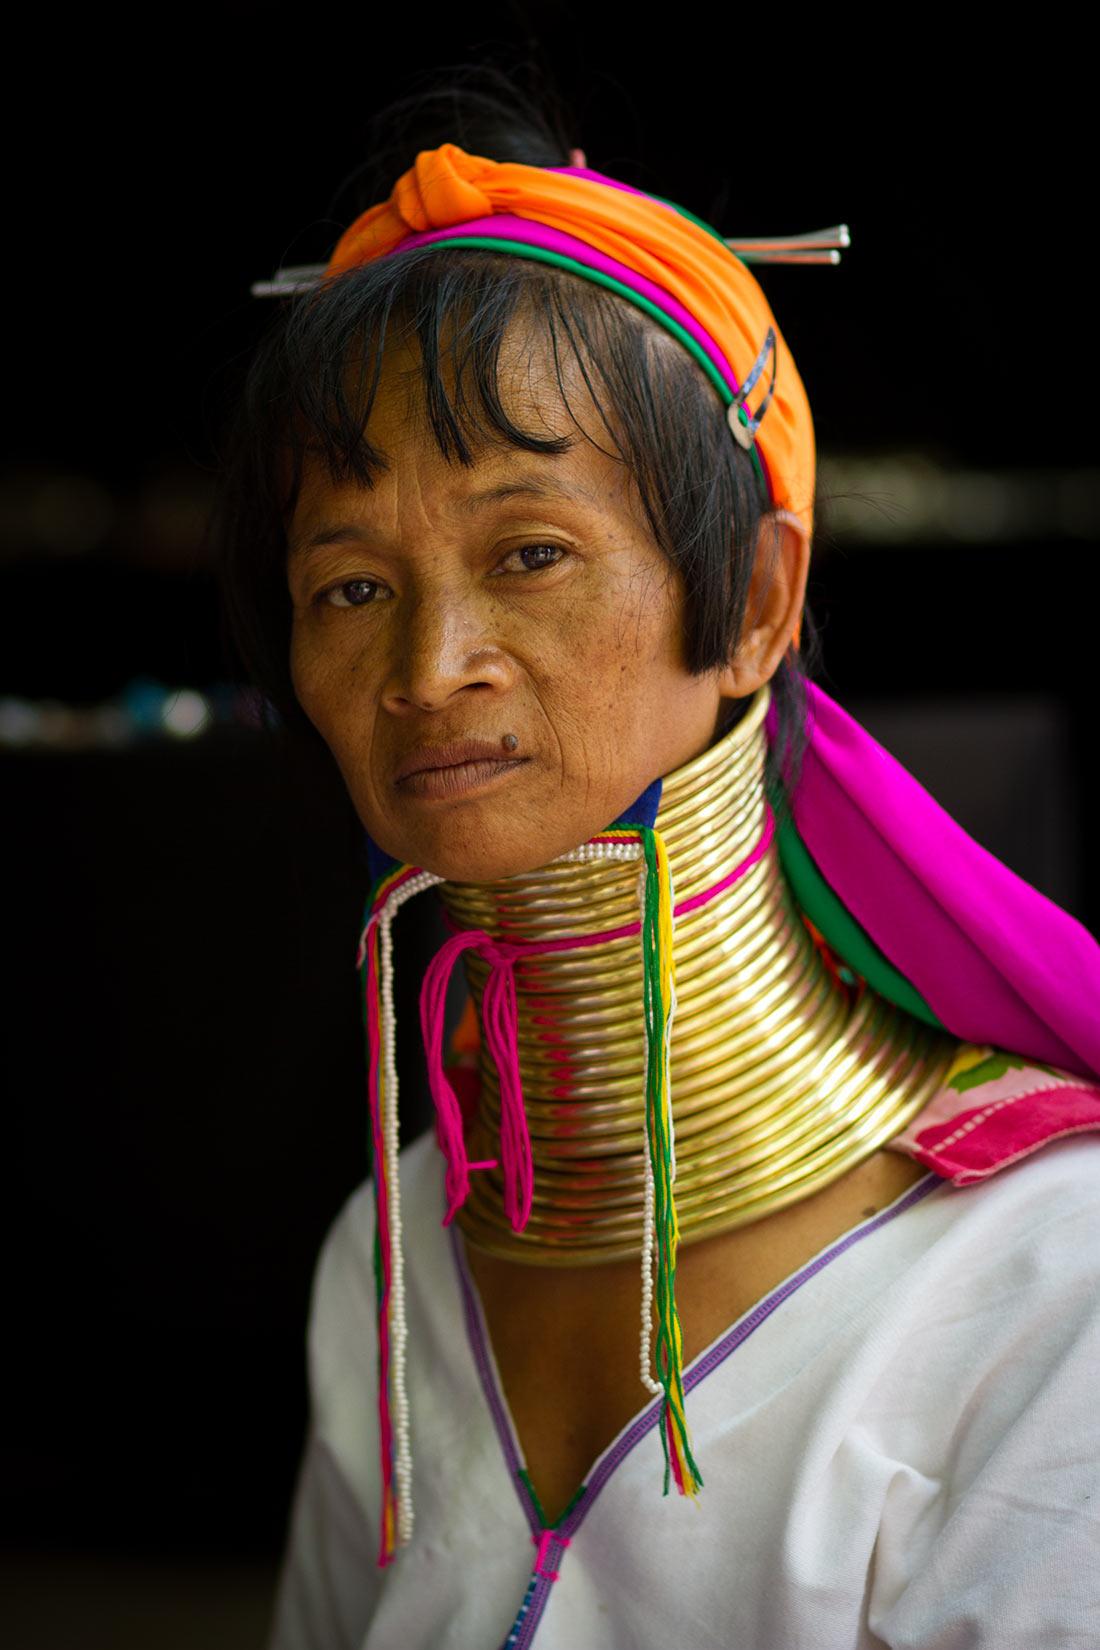 шейные кольца женщин падаунг